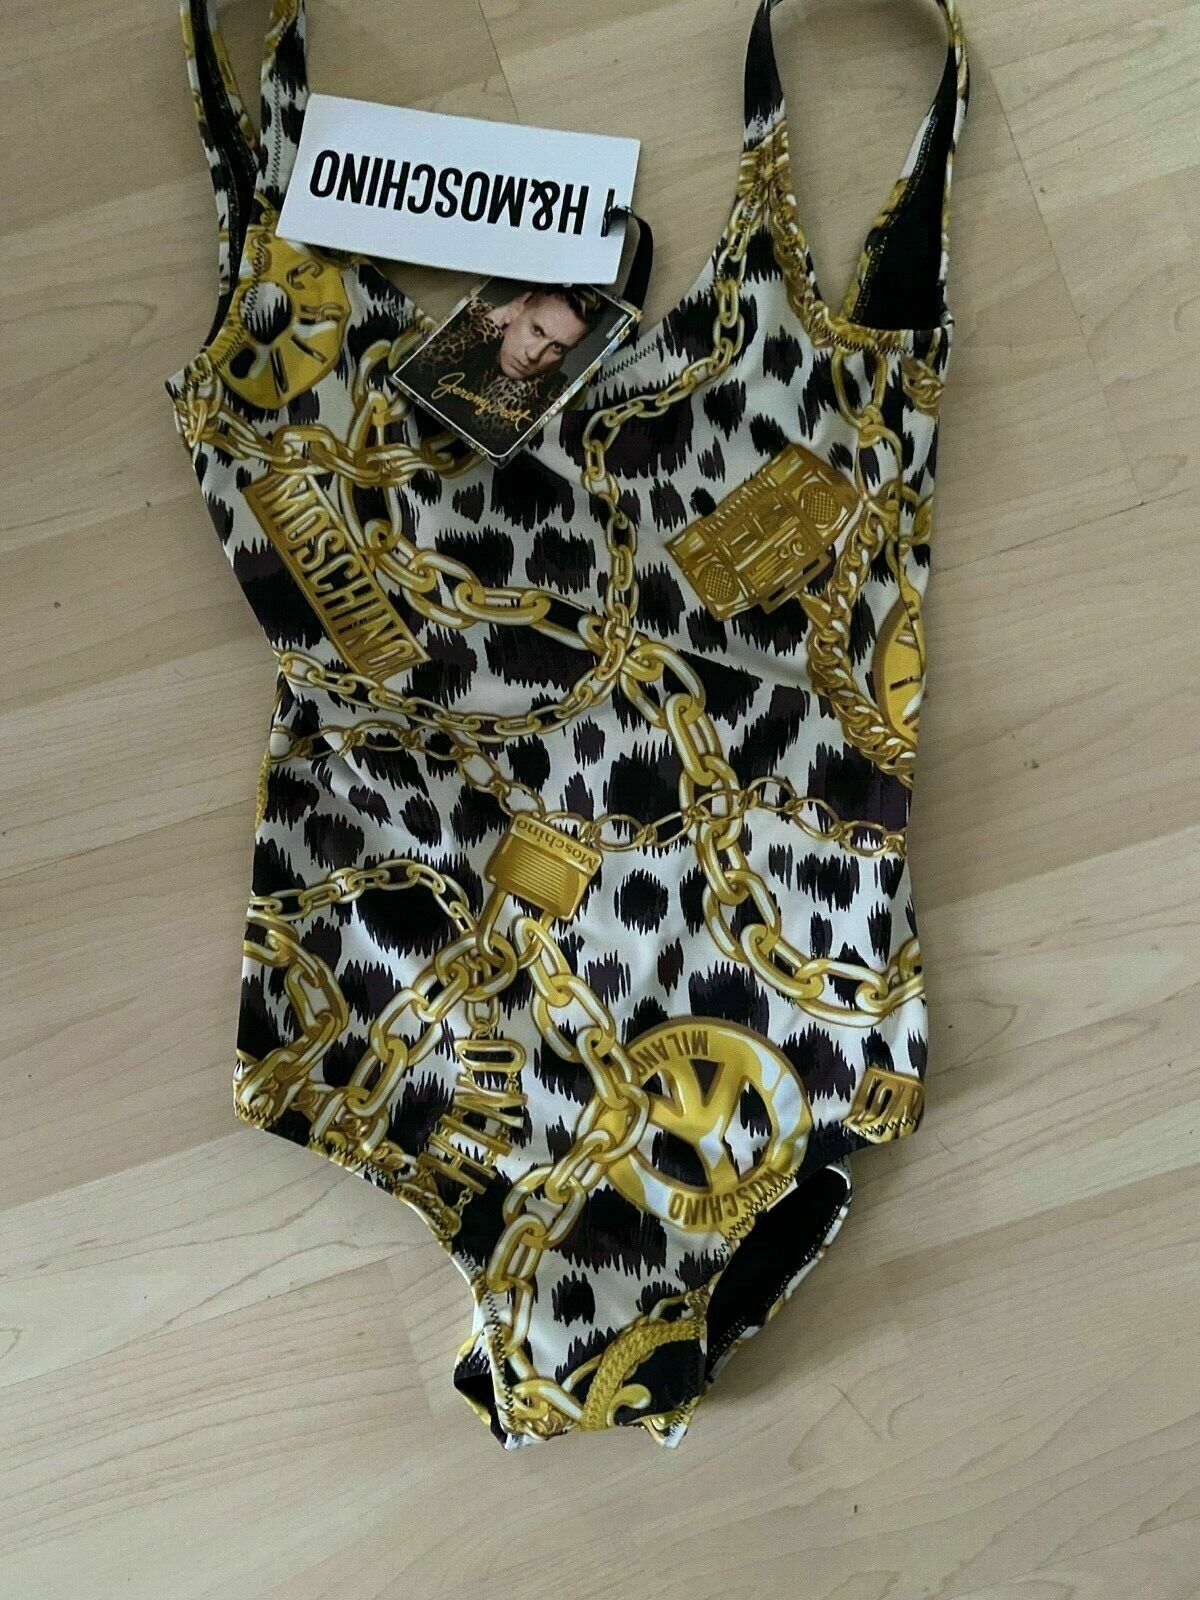 Moschino H&MOSCHINO TV H&M HM Body Badeanzug Swimsuit Ketten Chain EUR 36 US 4